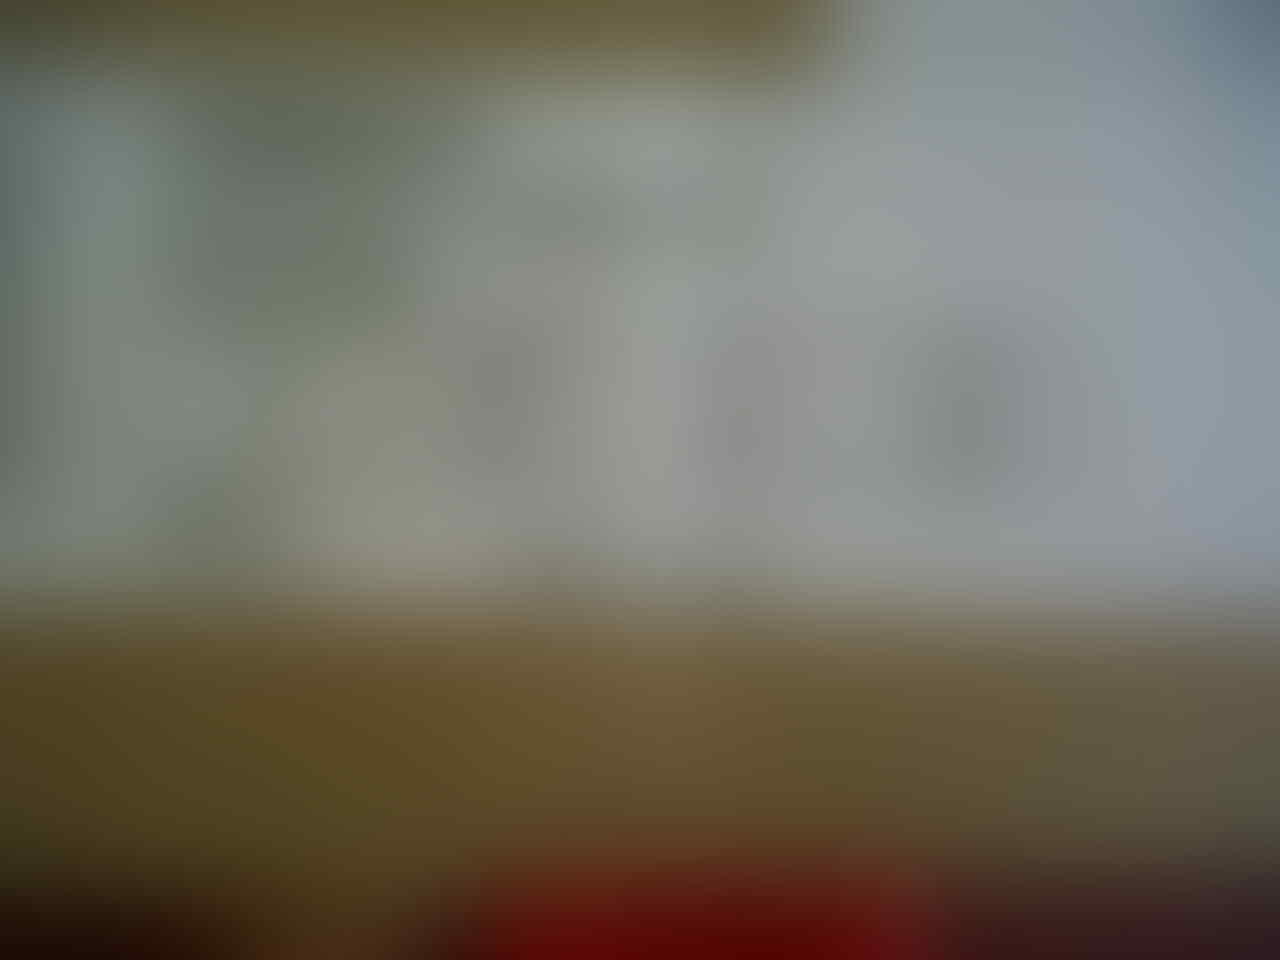 SEPATU PUMA EDISI MESH LOW BLACK/WHITE ORIGINAL. SIZE 43 (CIBINONG)